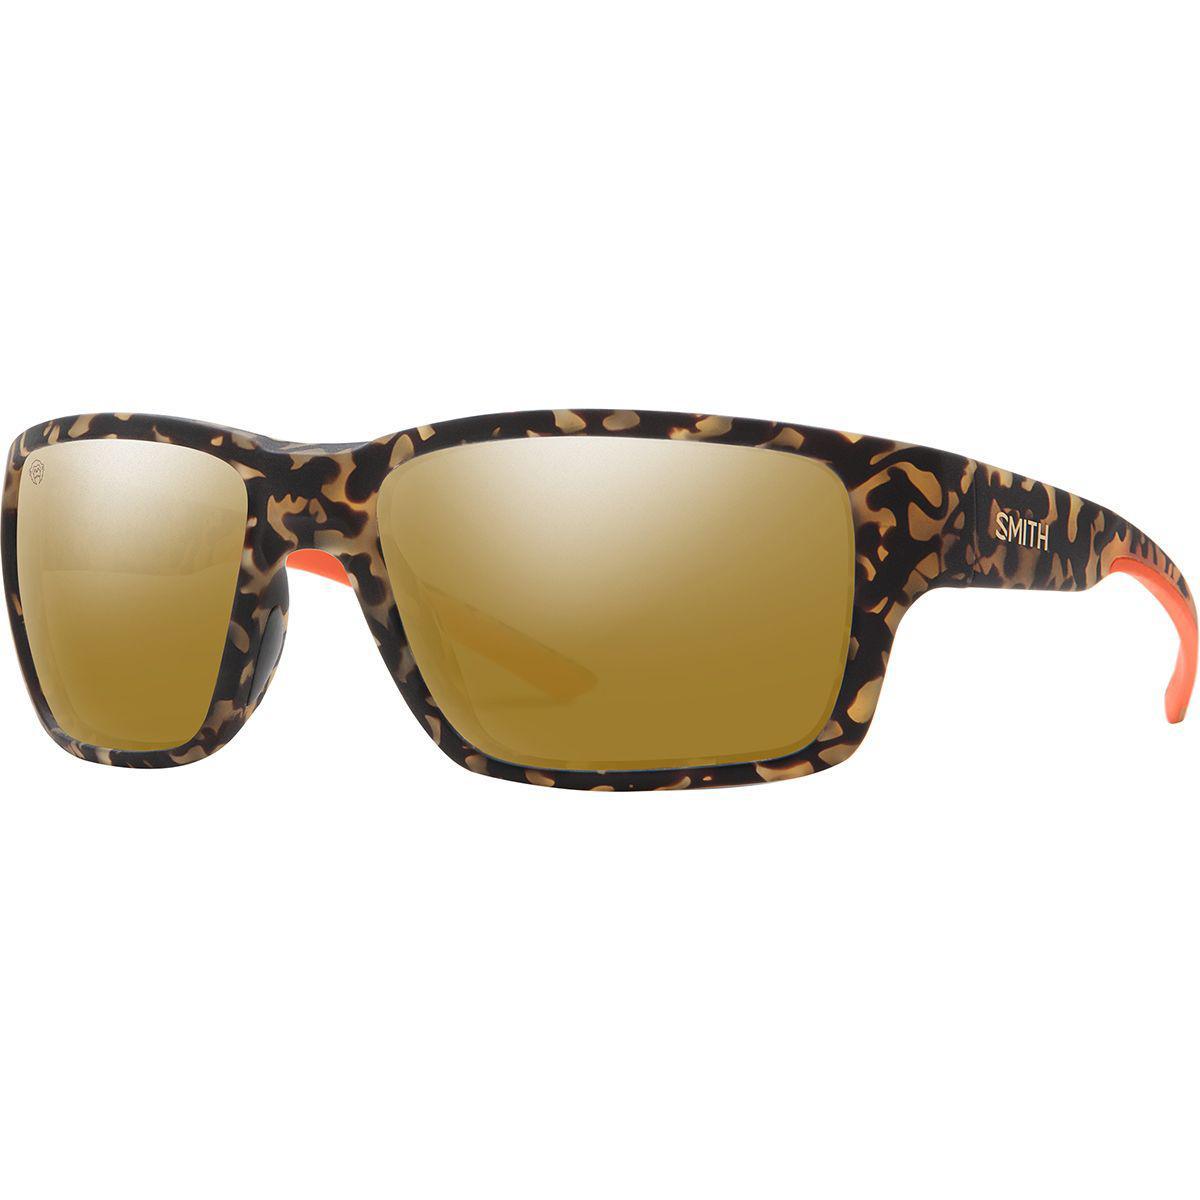 945f2ad922 Smith - Brown Outlier 2 Xl Chromapop Polarized Sunglasses for Men - Lyst.  View fullscreen